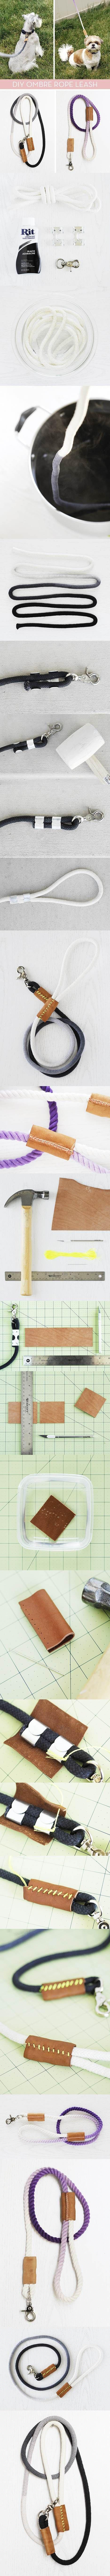 DIY Modern Dip-Dyed Rope Dog Leash 2 #DogDIY